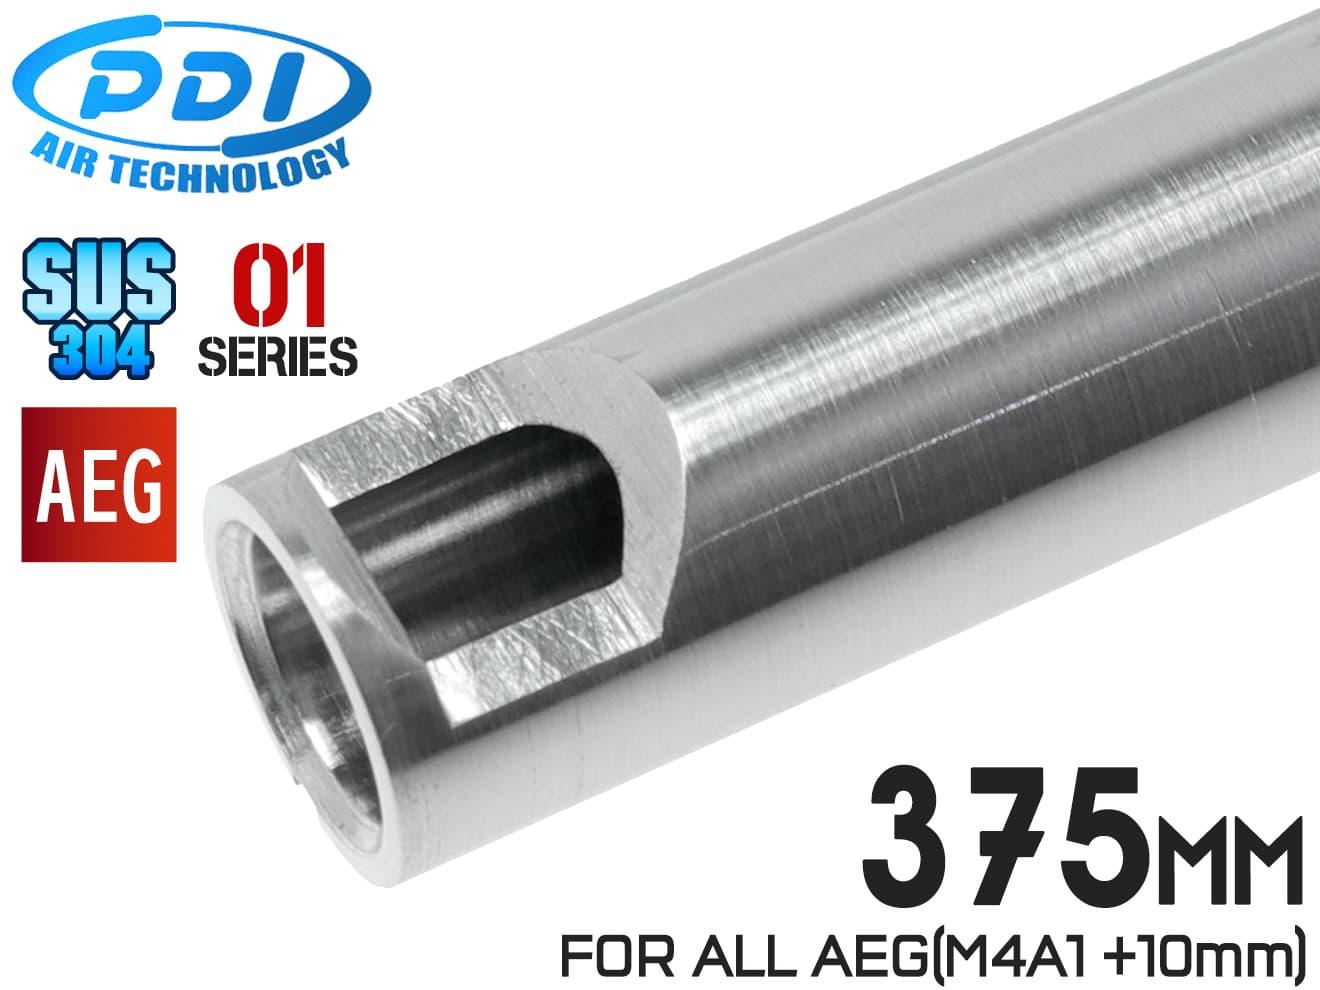 PDI 01シリーズ AEG 超精密 ステンレスインナーバレル(6.01±0.002) 375mm